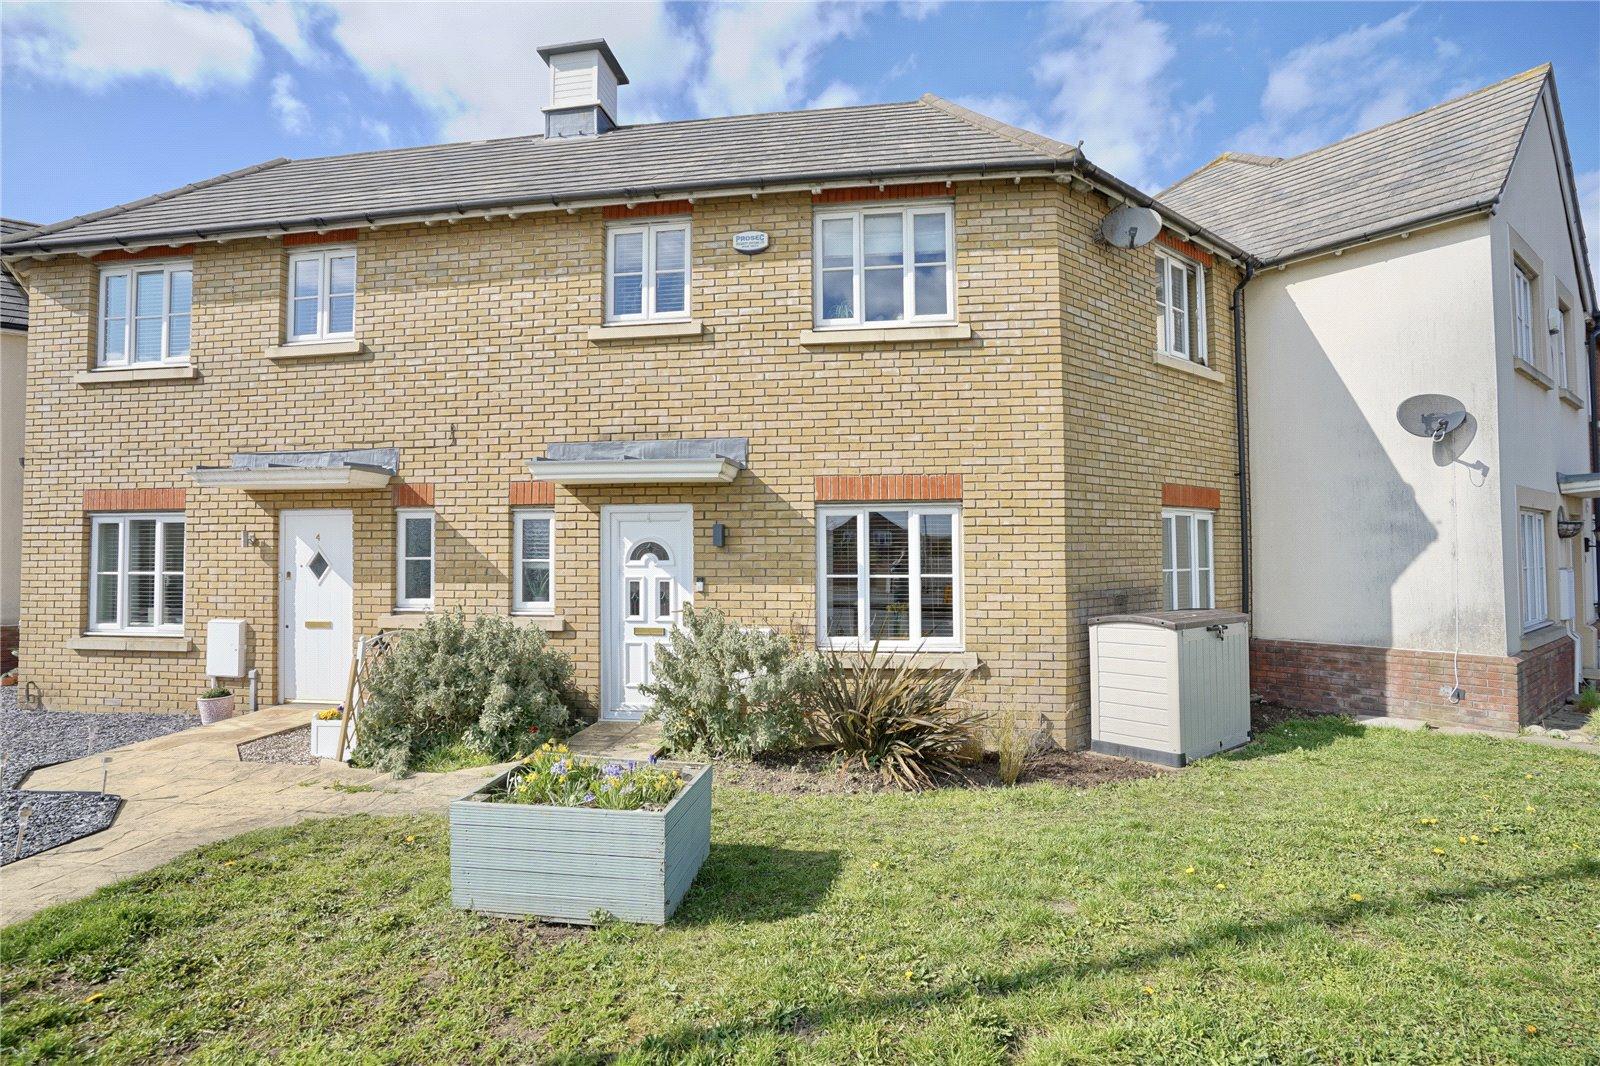 2 bed house for sale in Eynesbury, PE19 2HA, PE19